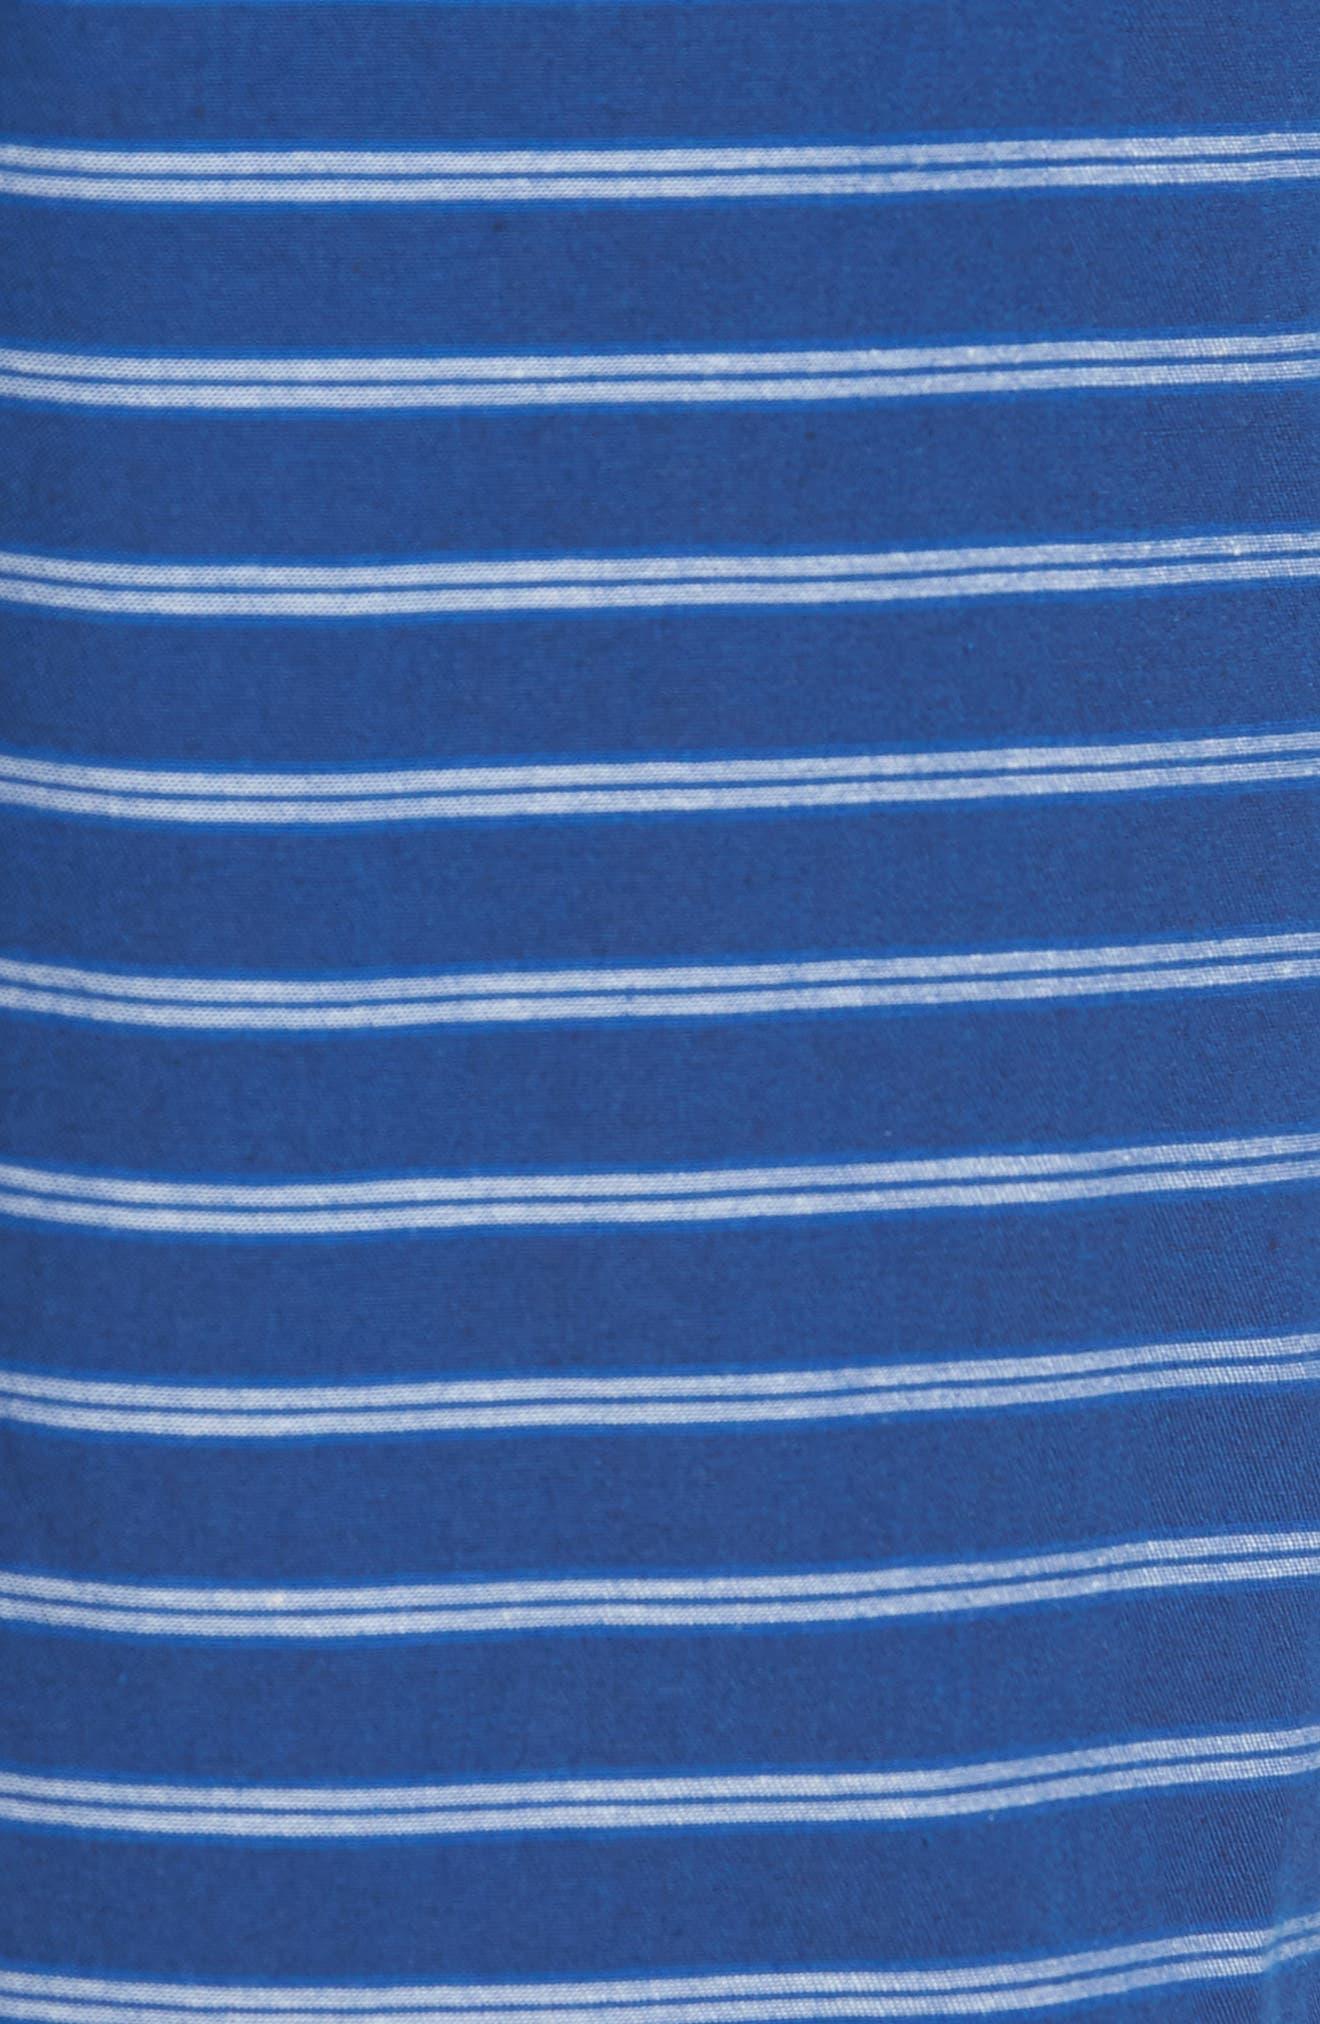 Slim Fit Stripe Beach Shorts,                             Alternate thumbnail 5, color,                             400